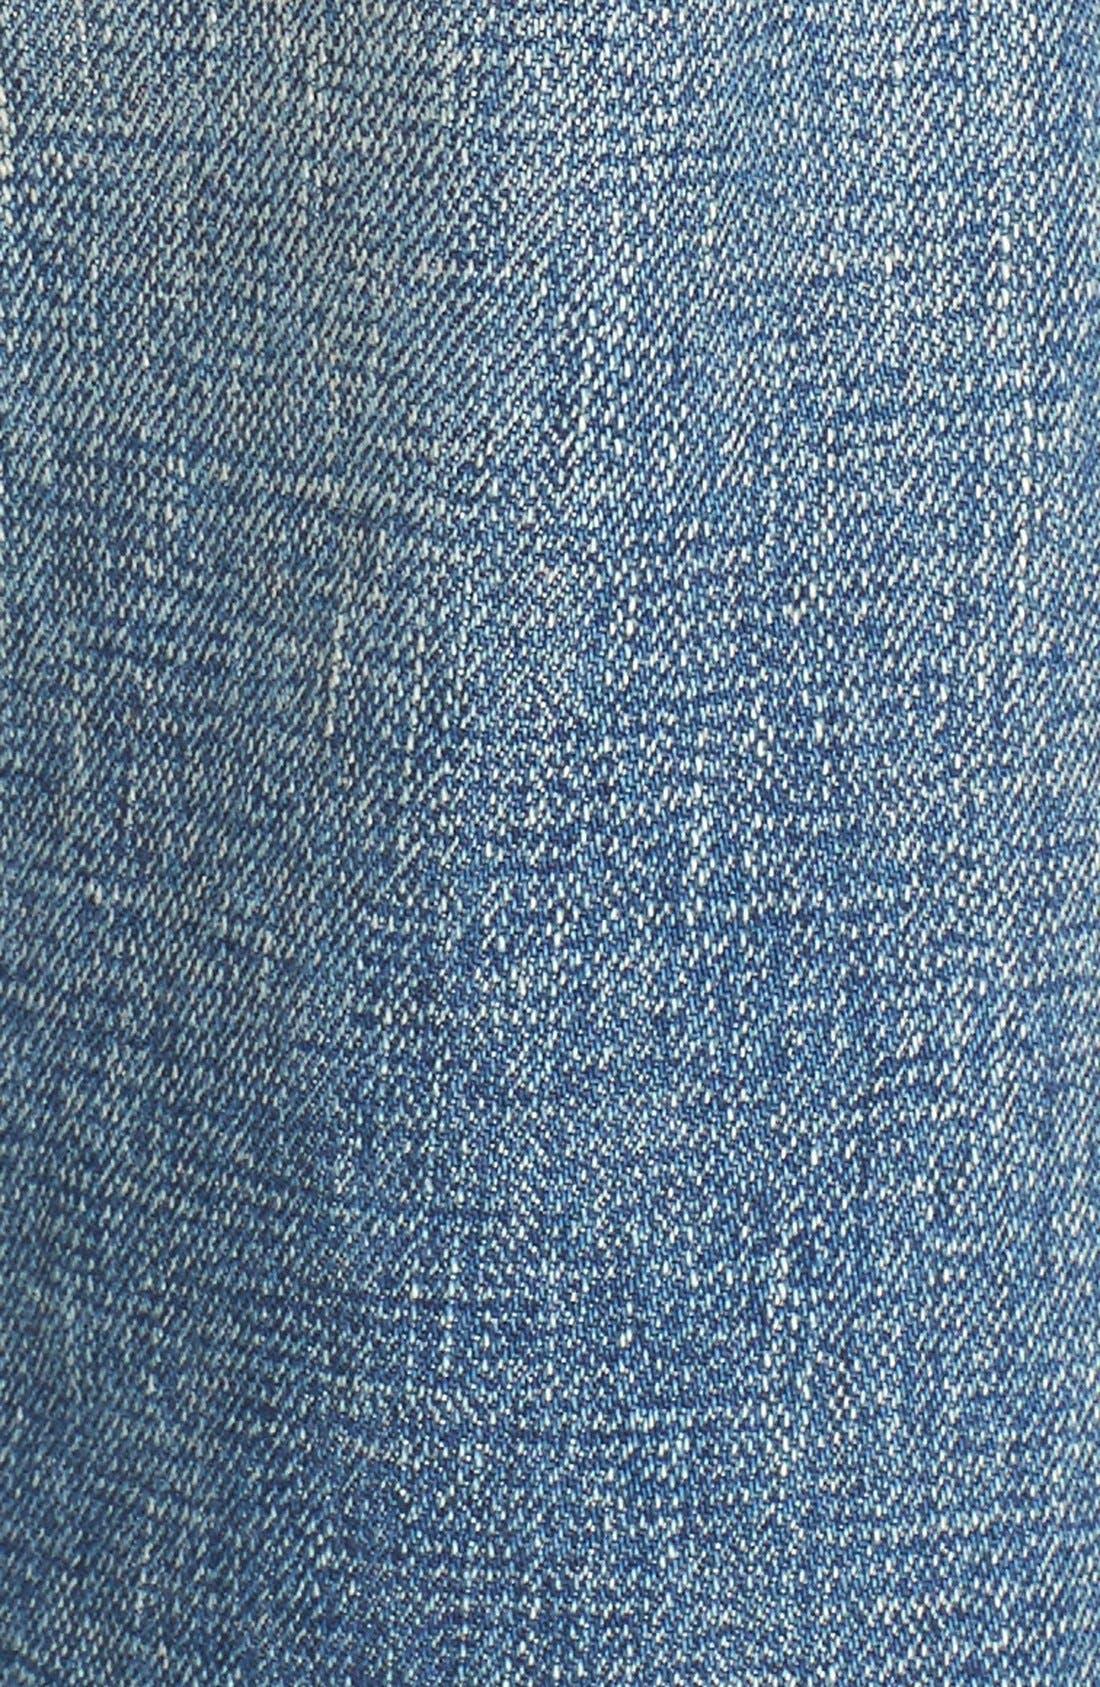 Alternate Image 3  - Tu es mon TRÉSOR Imitation Pearl Embellished Jeans